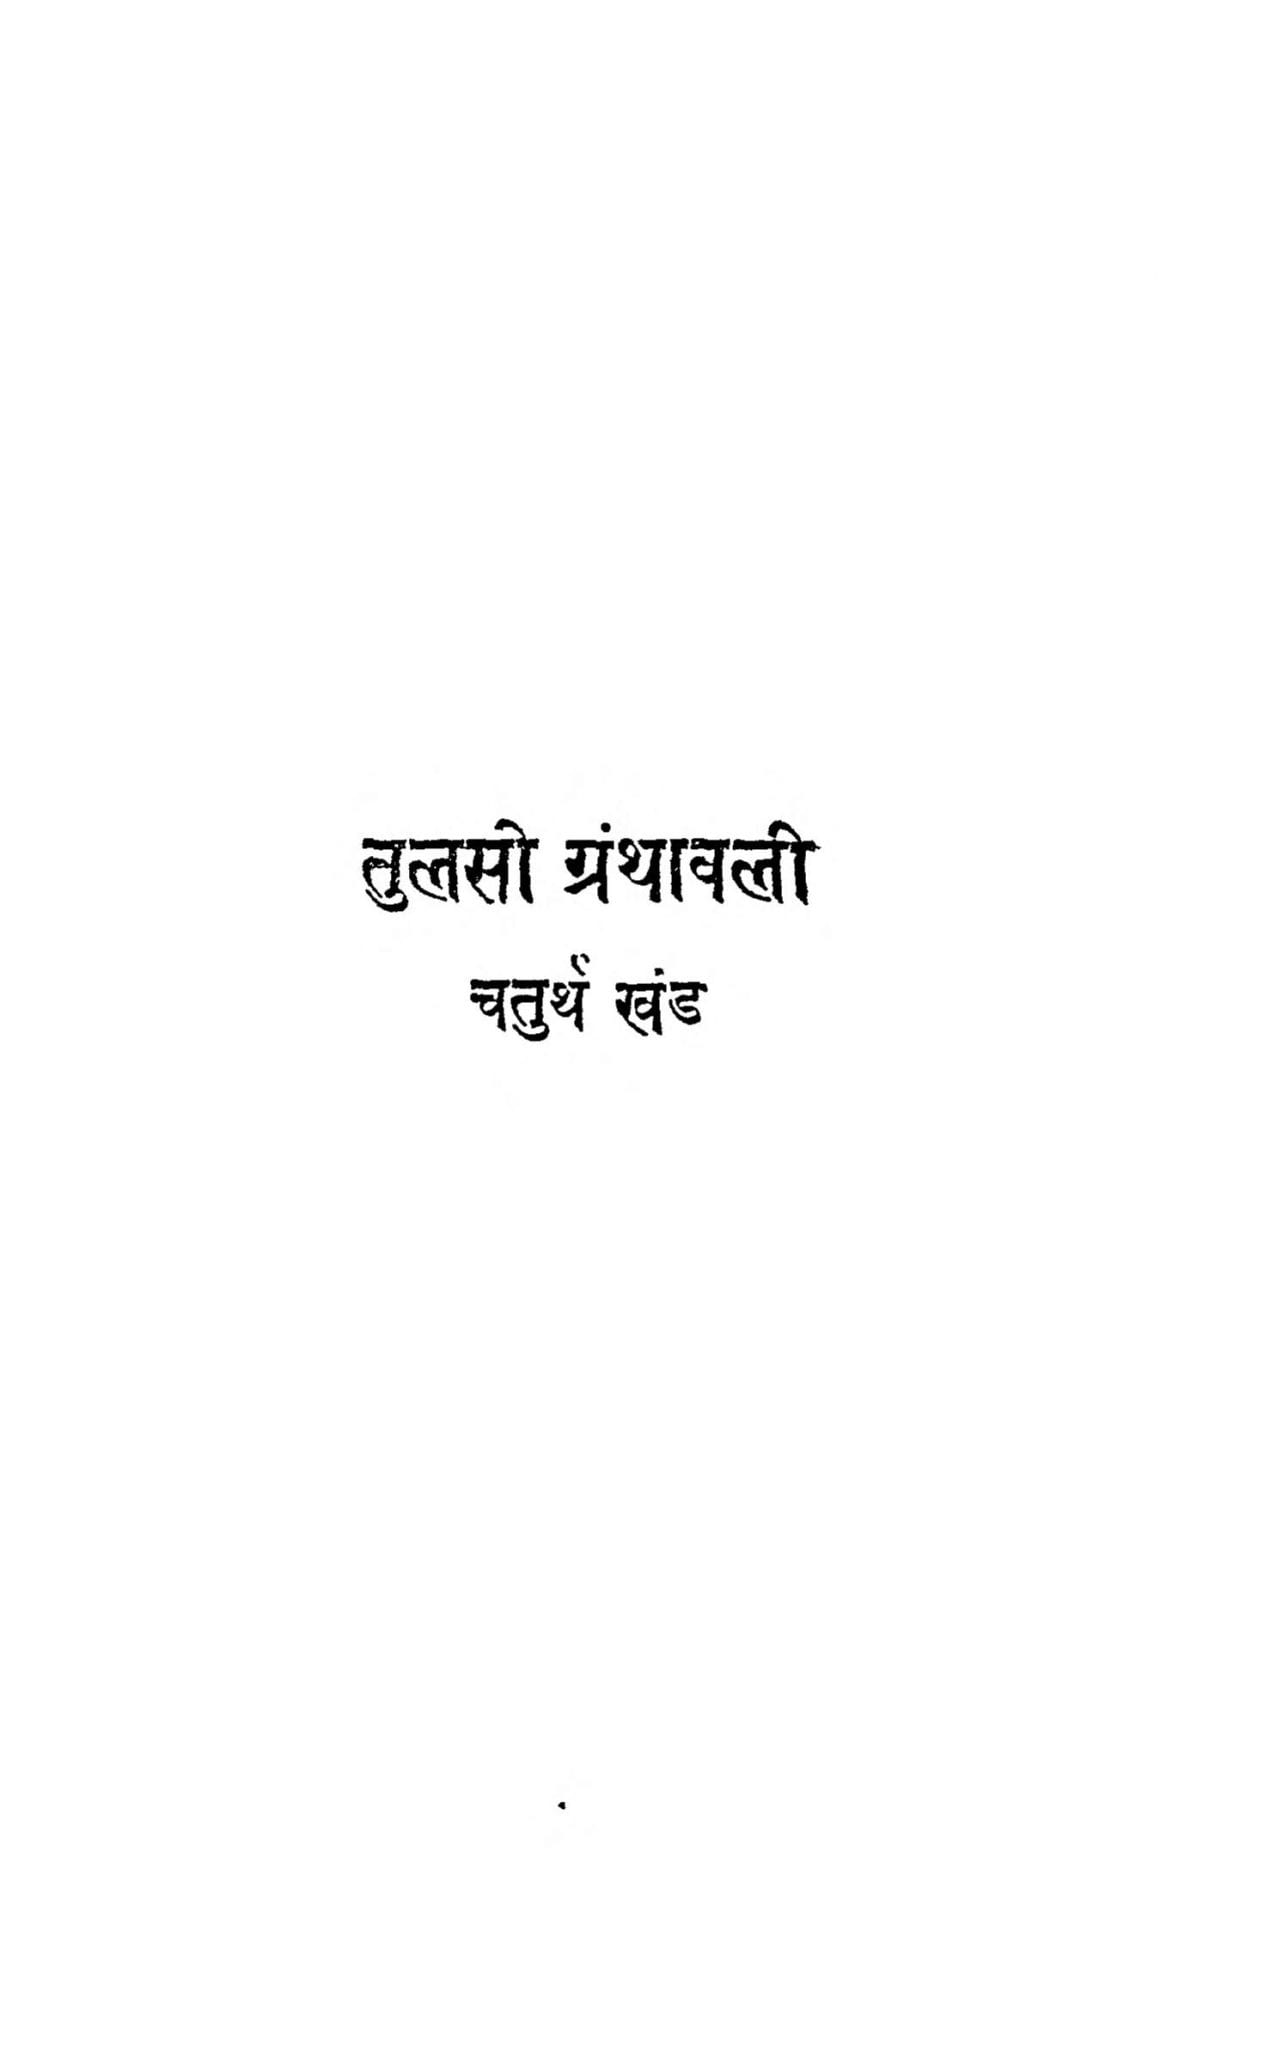 Book Image : तुलसी ग्रंथावली खंड - ४ - Tulasi Granthavali Khand-4